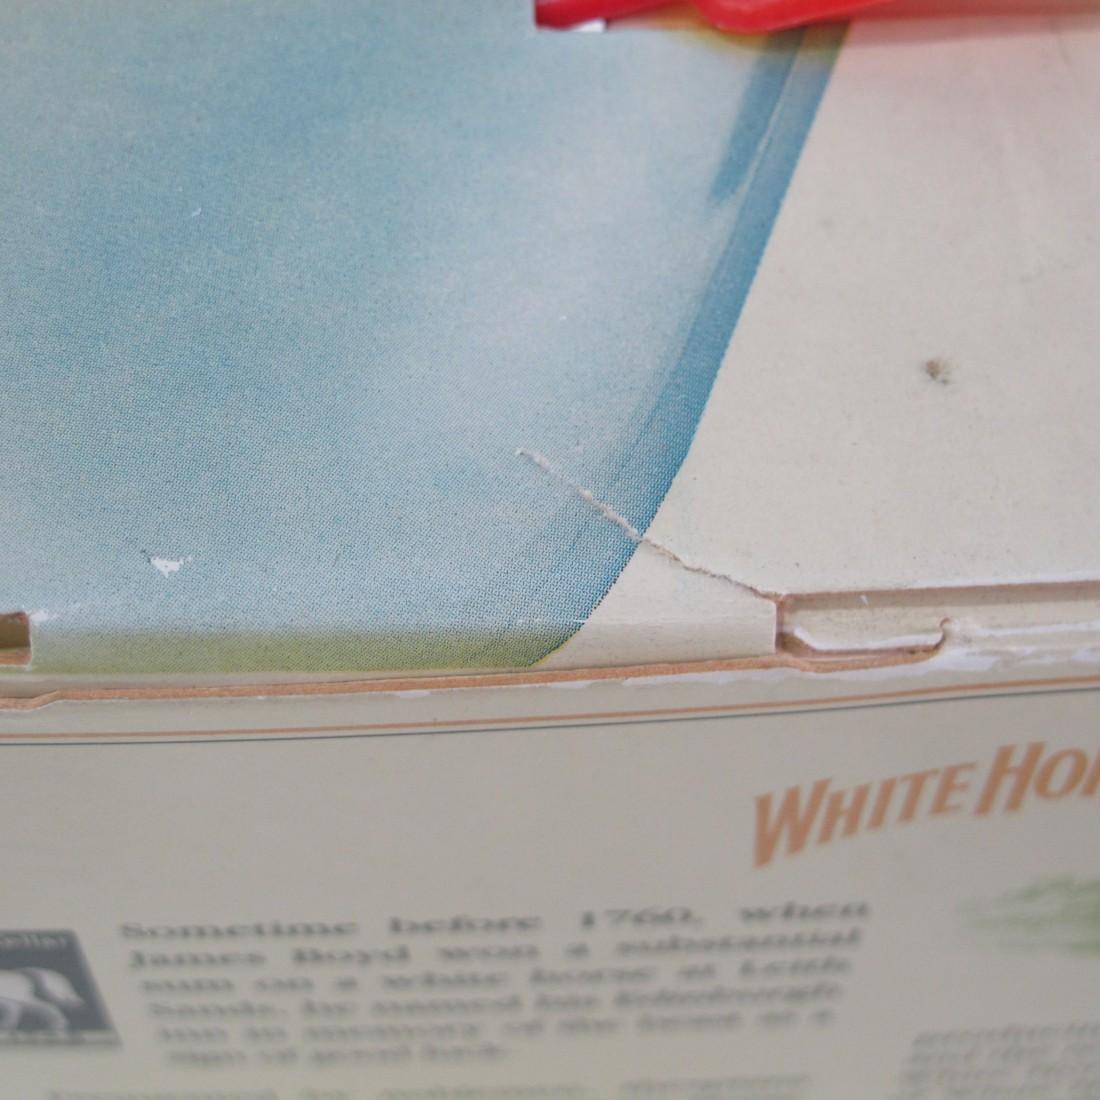 White Horse Scotch Whisky 2 x 70cl / includes Johnnie Walker Black Label 20cl